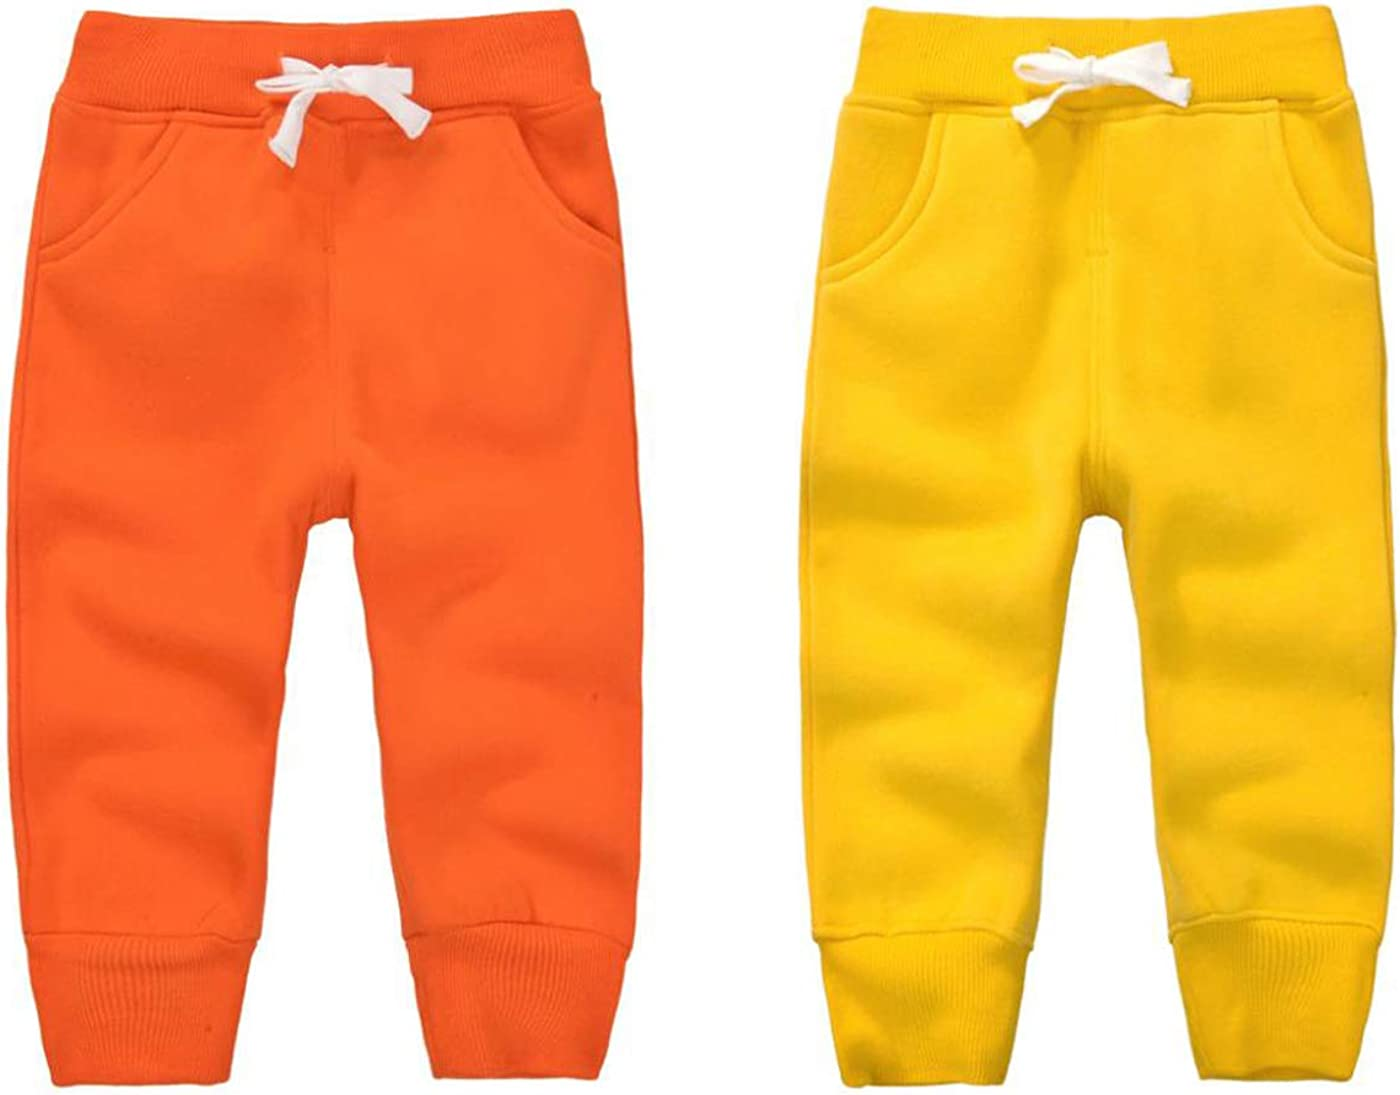 CuteOn Unisex Toddler Jogger Pants Kids Cotton Elastic Waist Winter Baby Sweatpants Pants 1-5Years